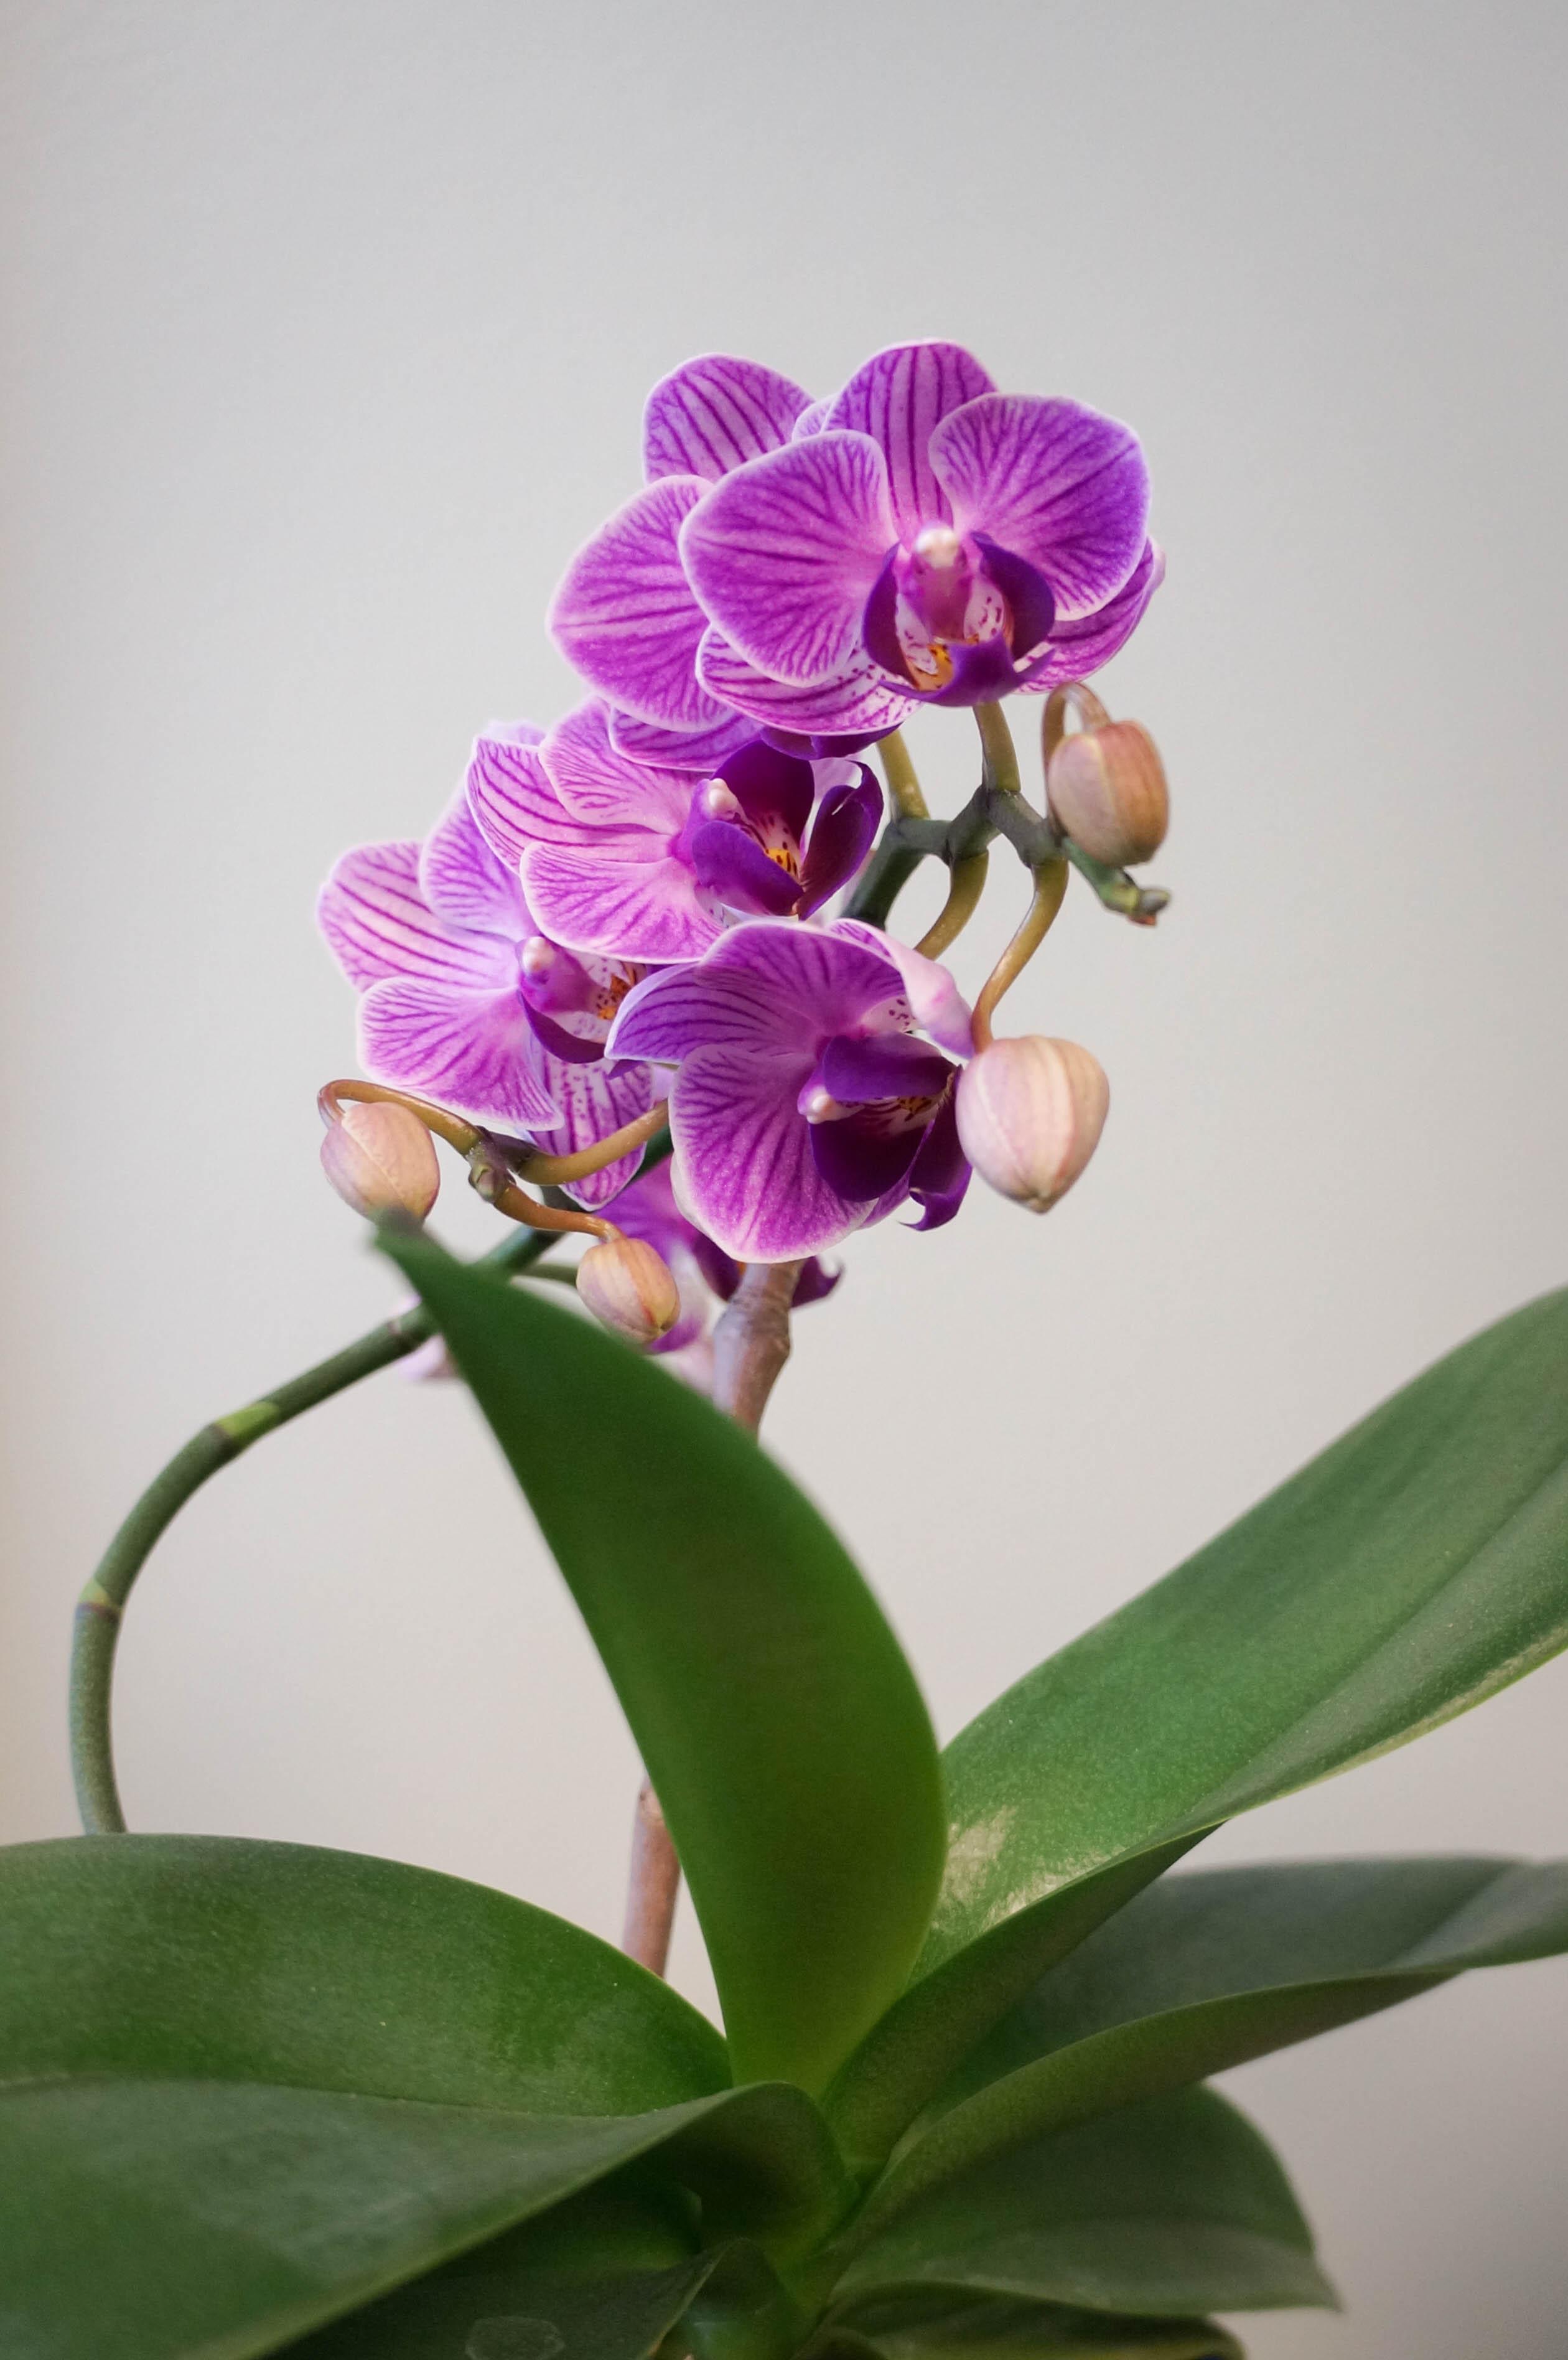 https://extension.illinois.edu/photolib/lib2211/Orchid%5F2.jpg